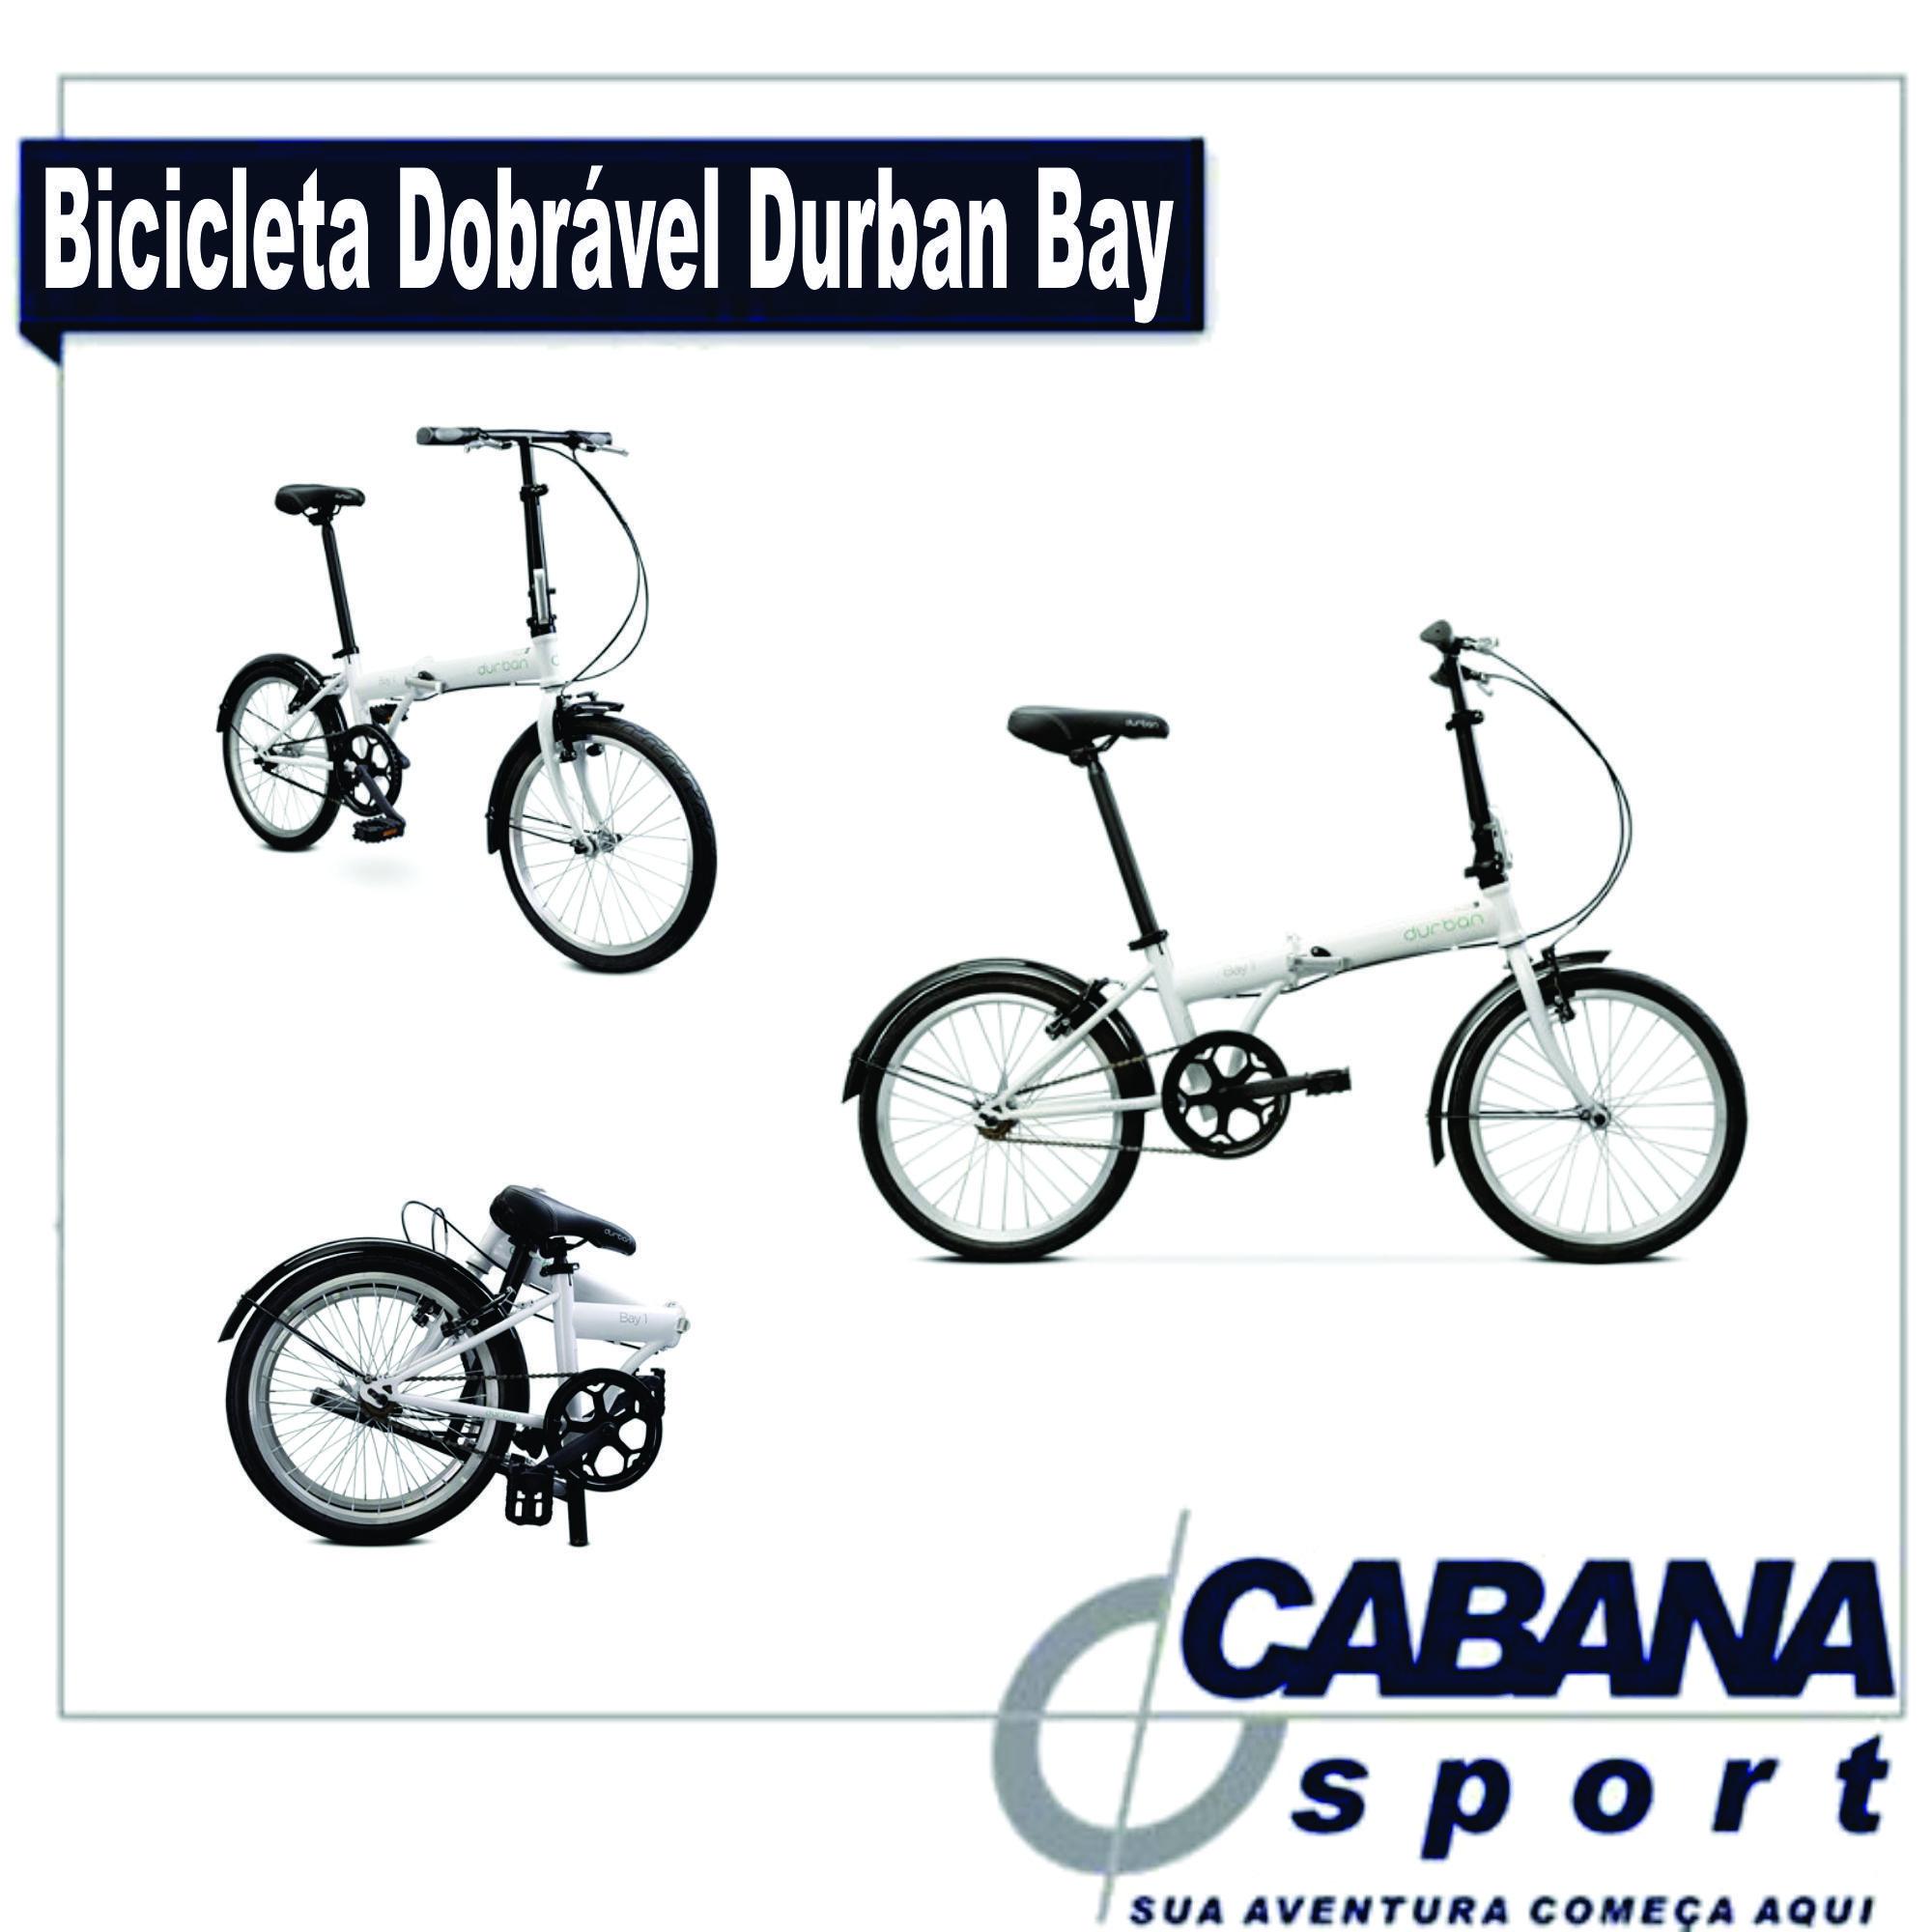 Vamos Pedalar ?  Bicicletas Dobráveis na Cabana Sport http://goo.gl/y2SdjA